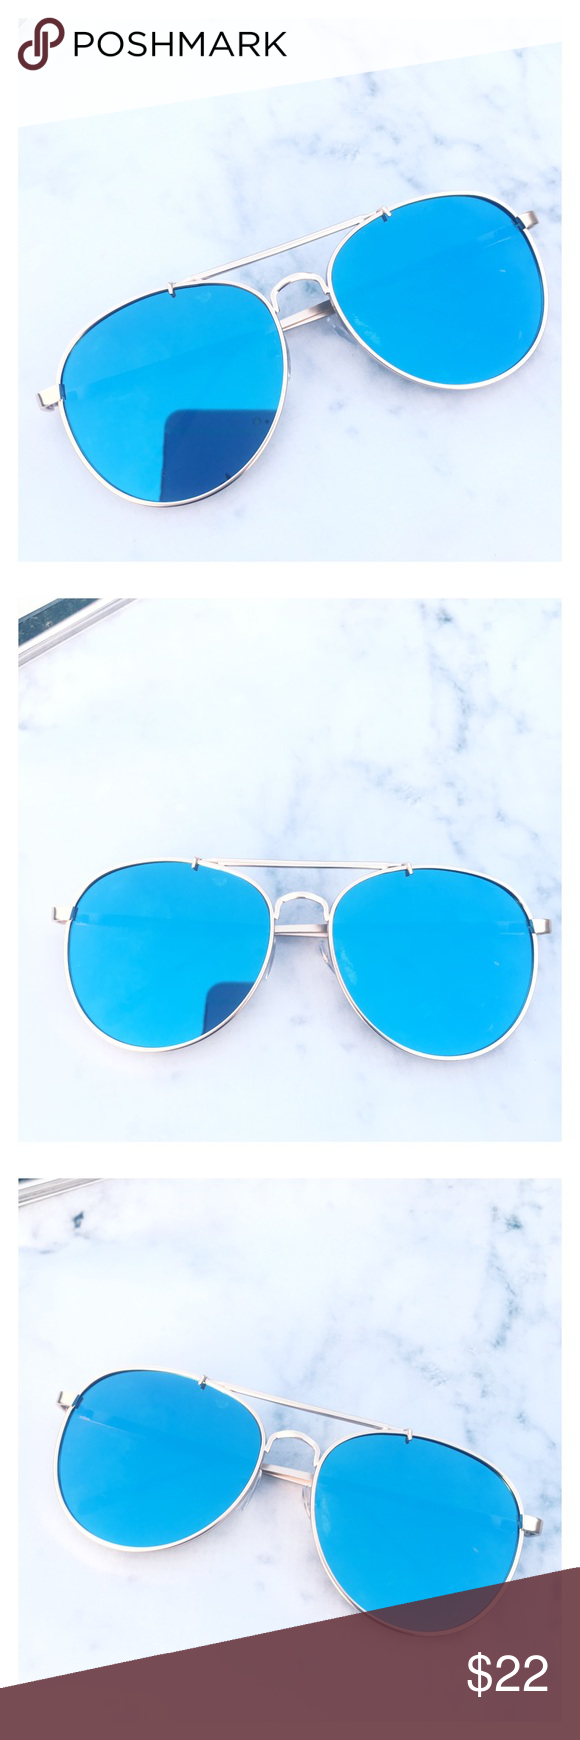 64ee58f432c9e Blue Mirrored Aviator Sunglasses Stylish pair of blue Aviator sunglasses. Blue  Mirrored Sunglasses. Trending sunglasses. UV protection. Brand new.